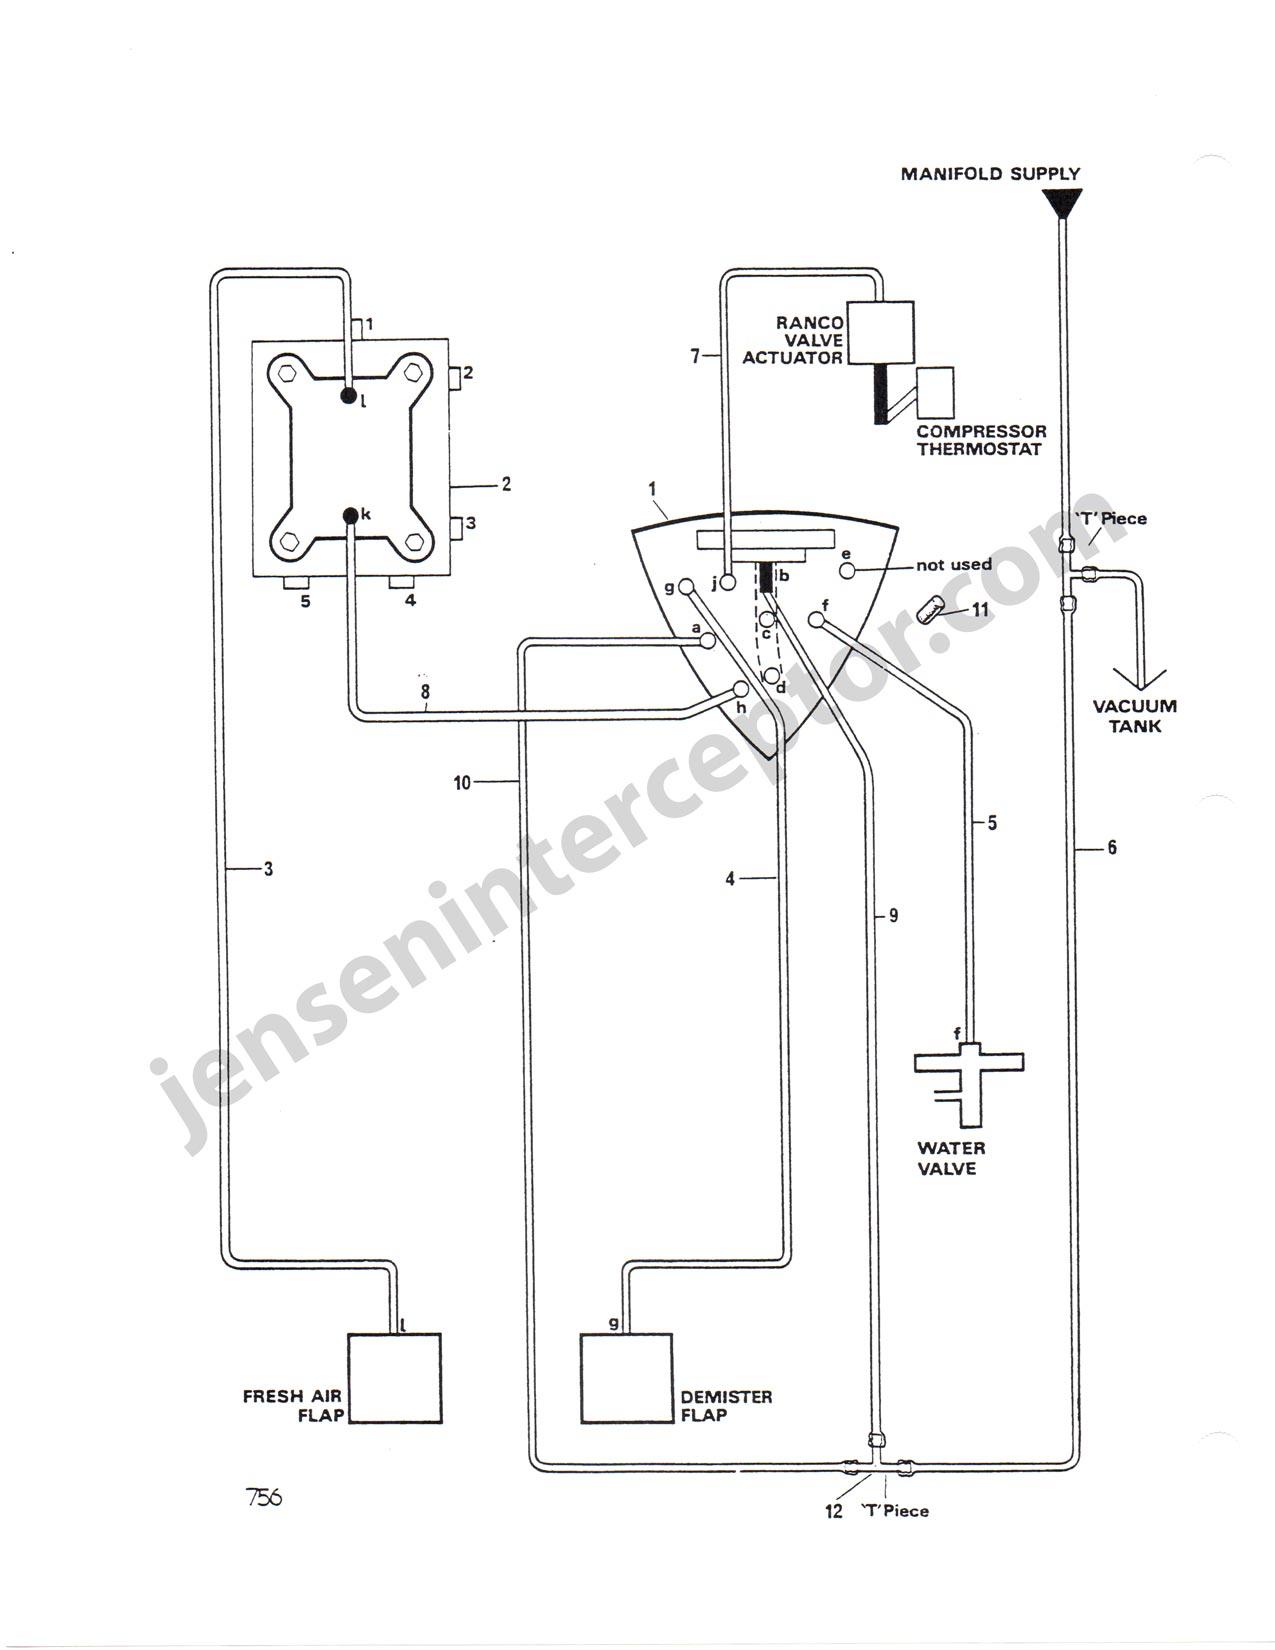 1974 Jensen Interceptor Wiring Diagram Electrical Diagrams For Vacuum Hose Iii